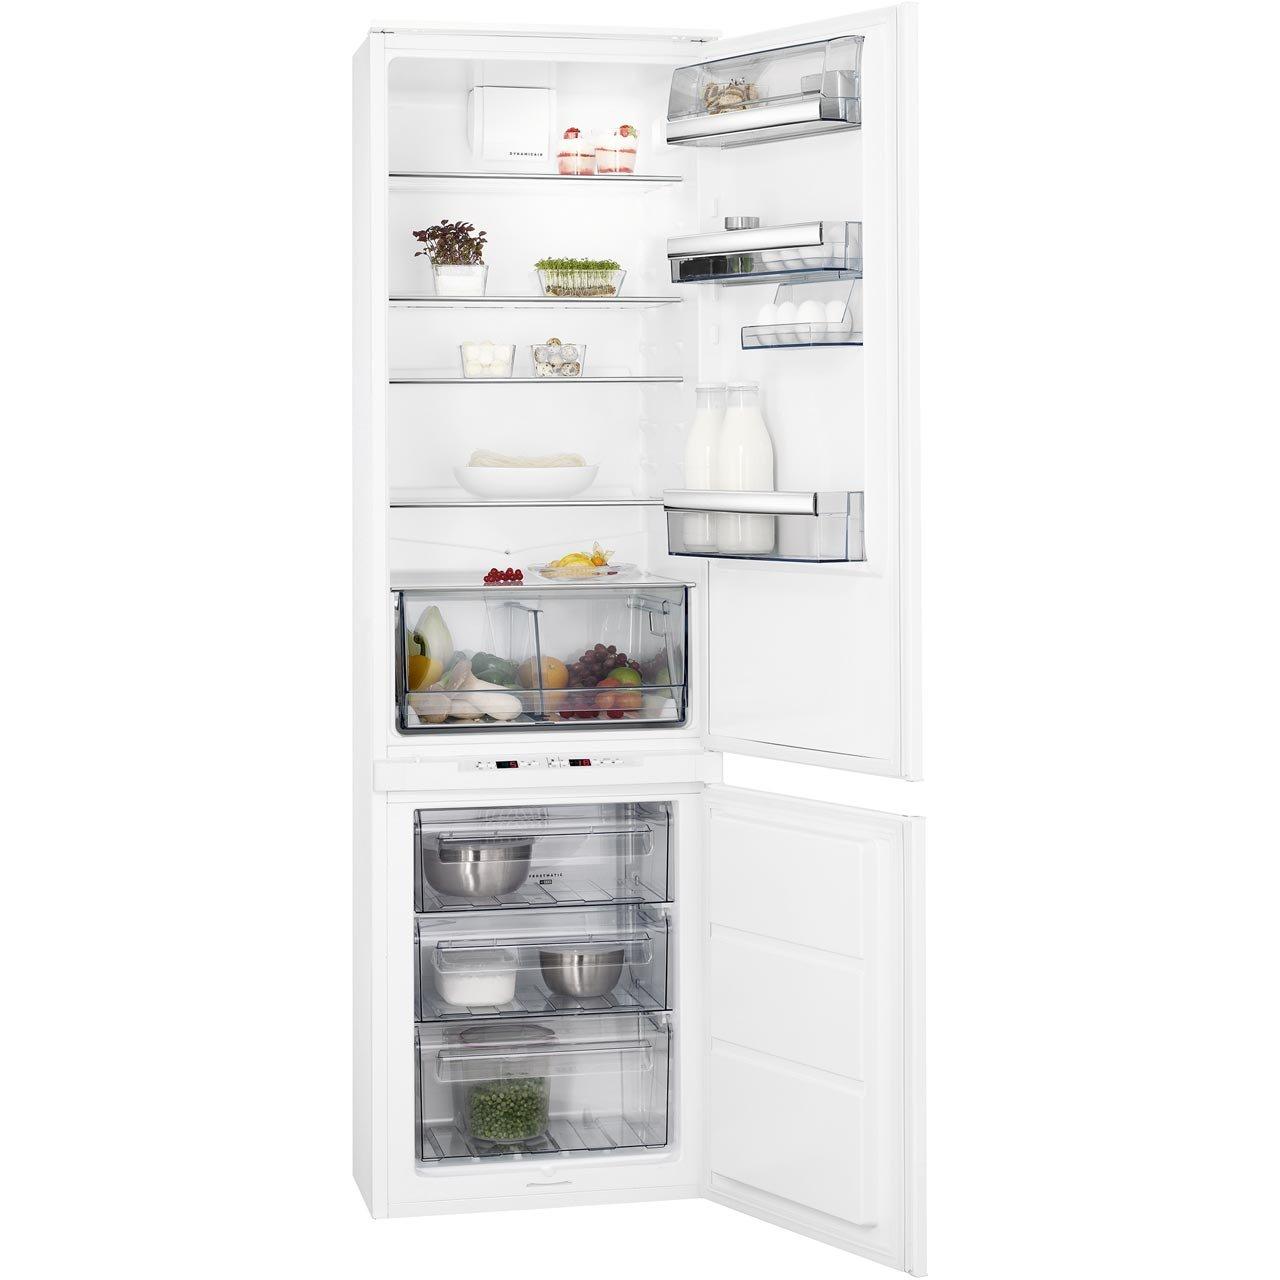 AEG SCS8191LTS Integrated 70/30 Frost Free Fridge Freezer with Sliding Door Fixing Kit White